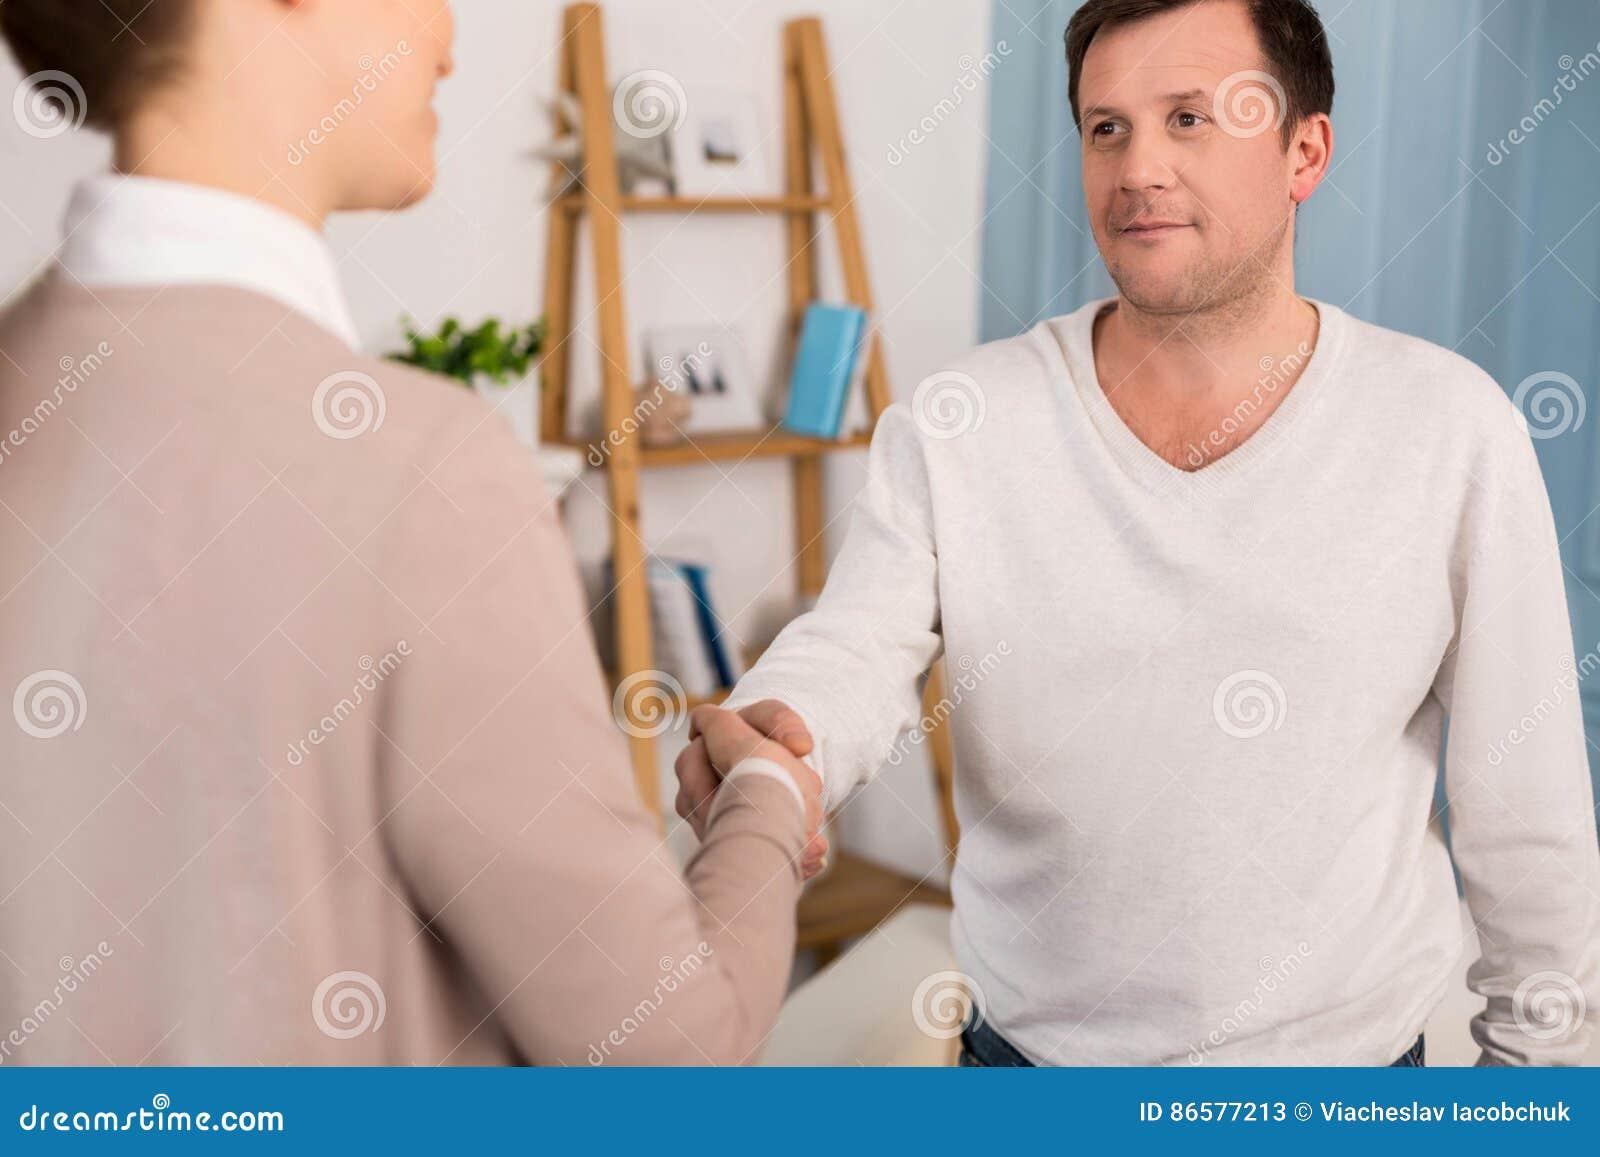 Nice pleasant man greeting a woman stock image image of nice pleasant man greeting a woman m4hsunfo